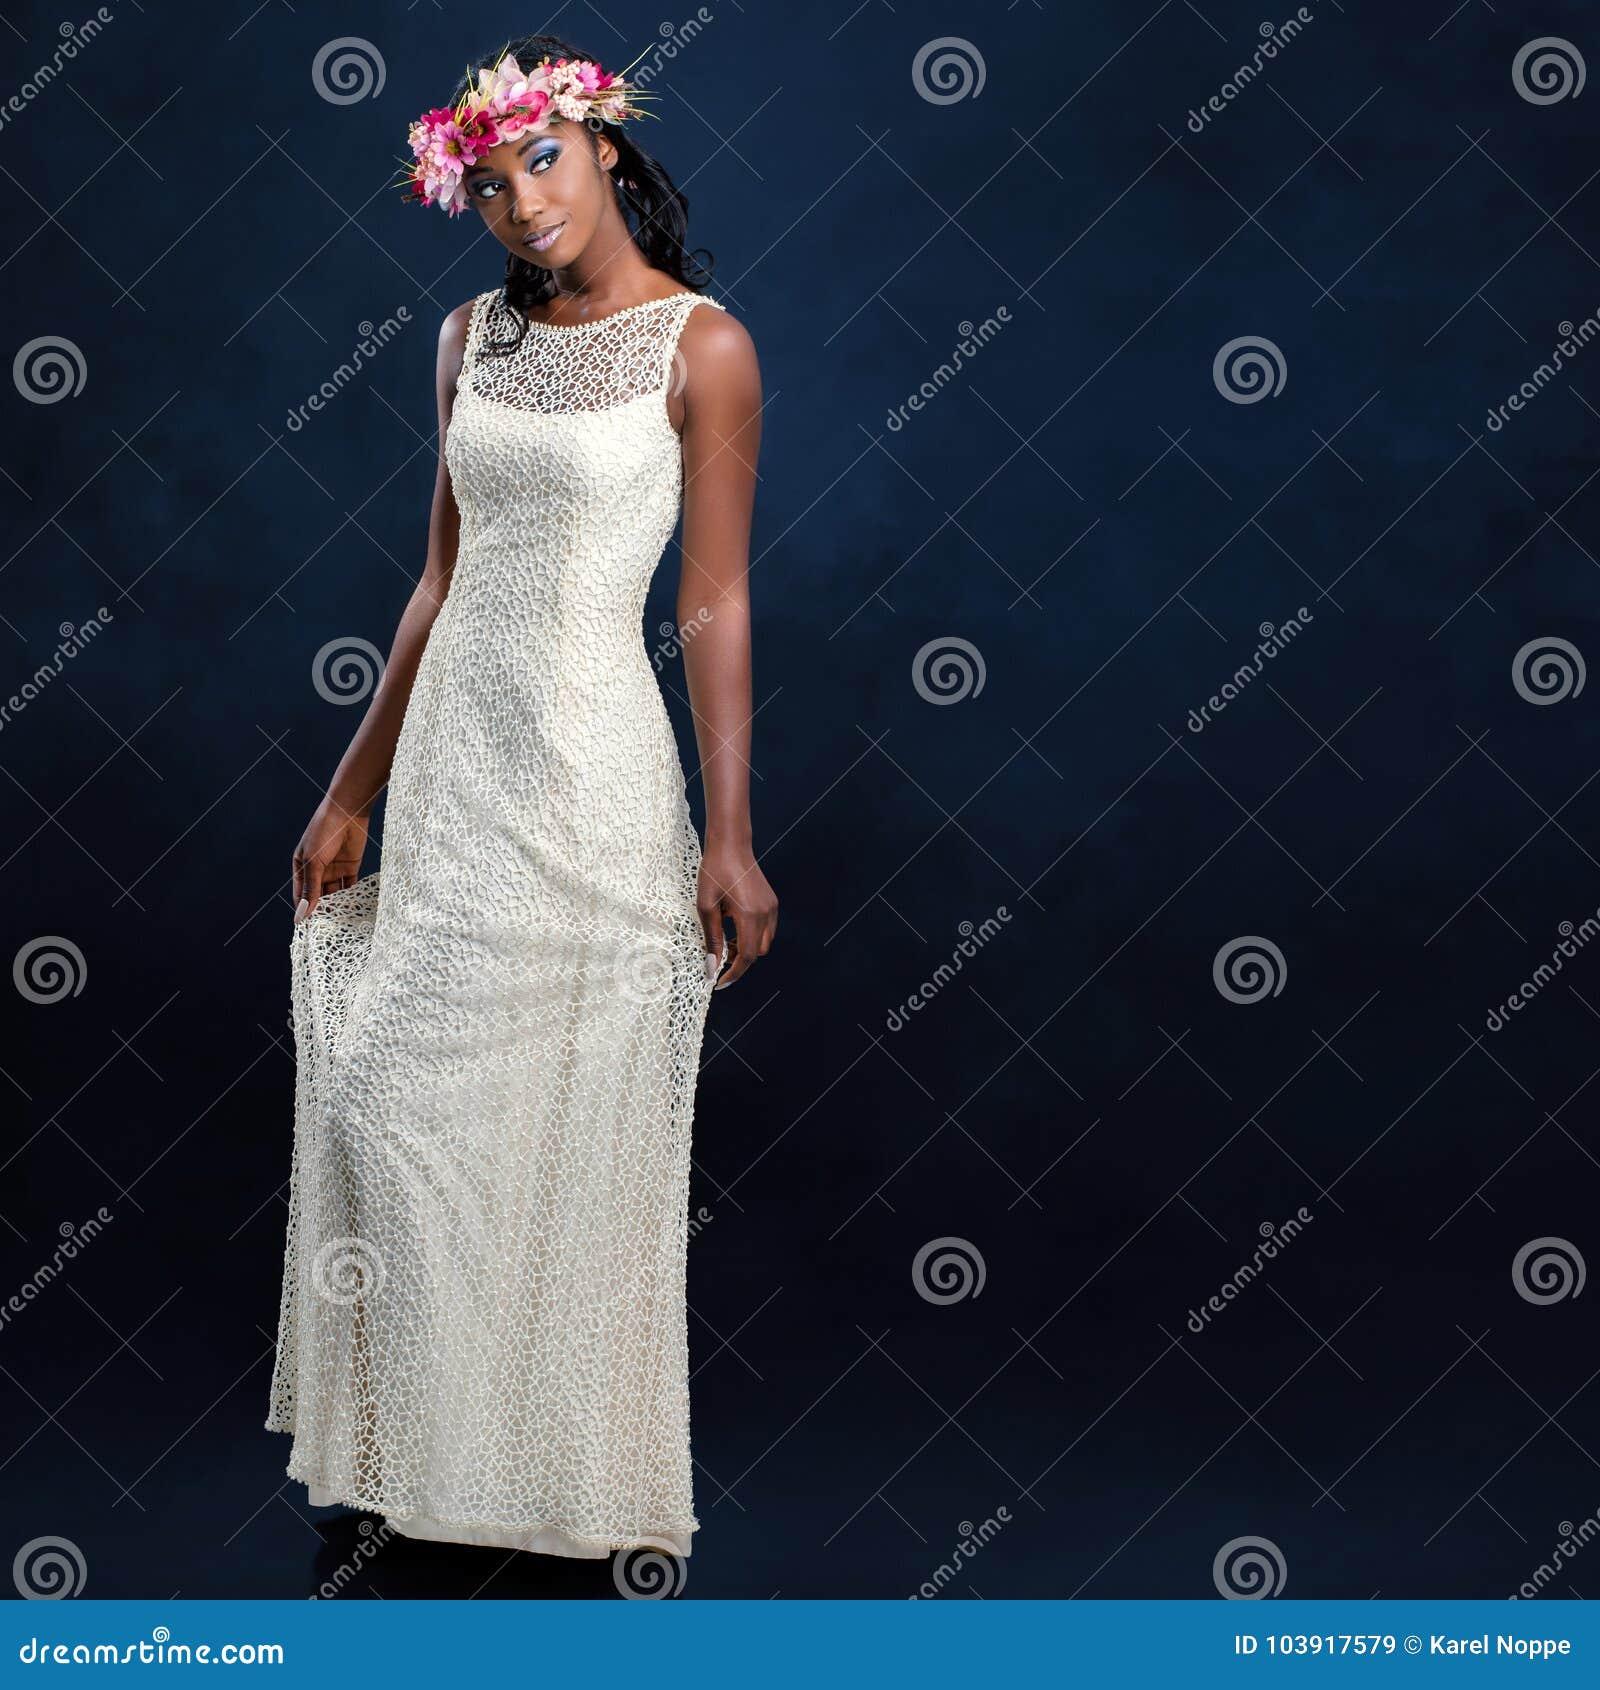 Belle Jeune Jeune Mariee Africaine Dans La Robe De Mariage